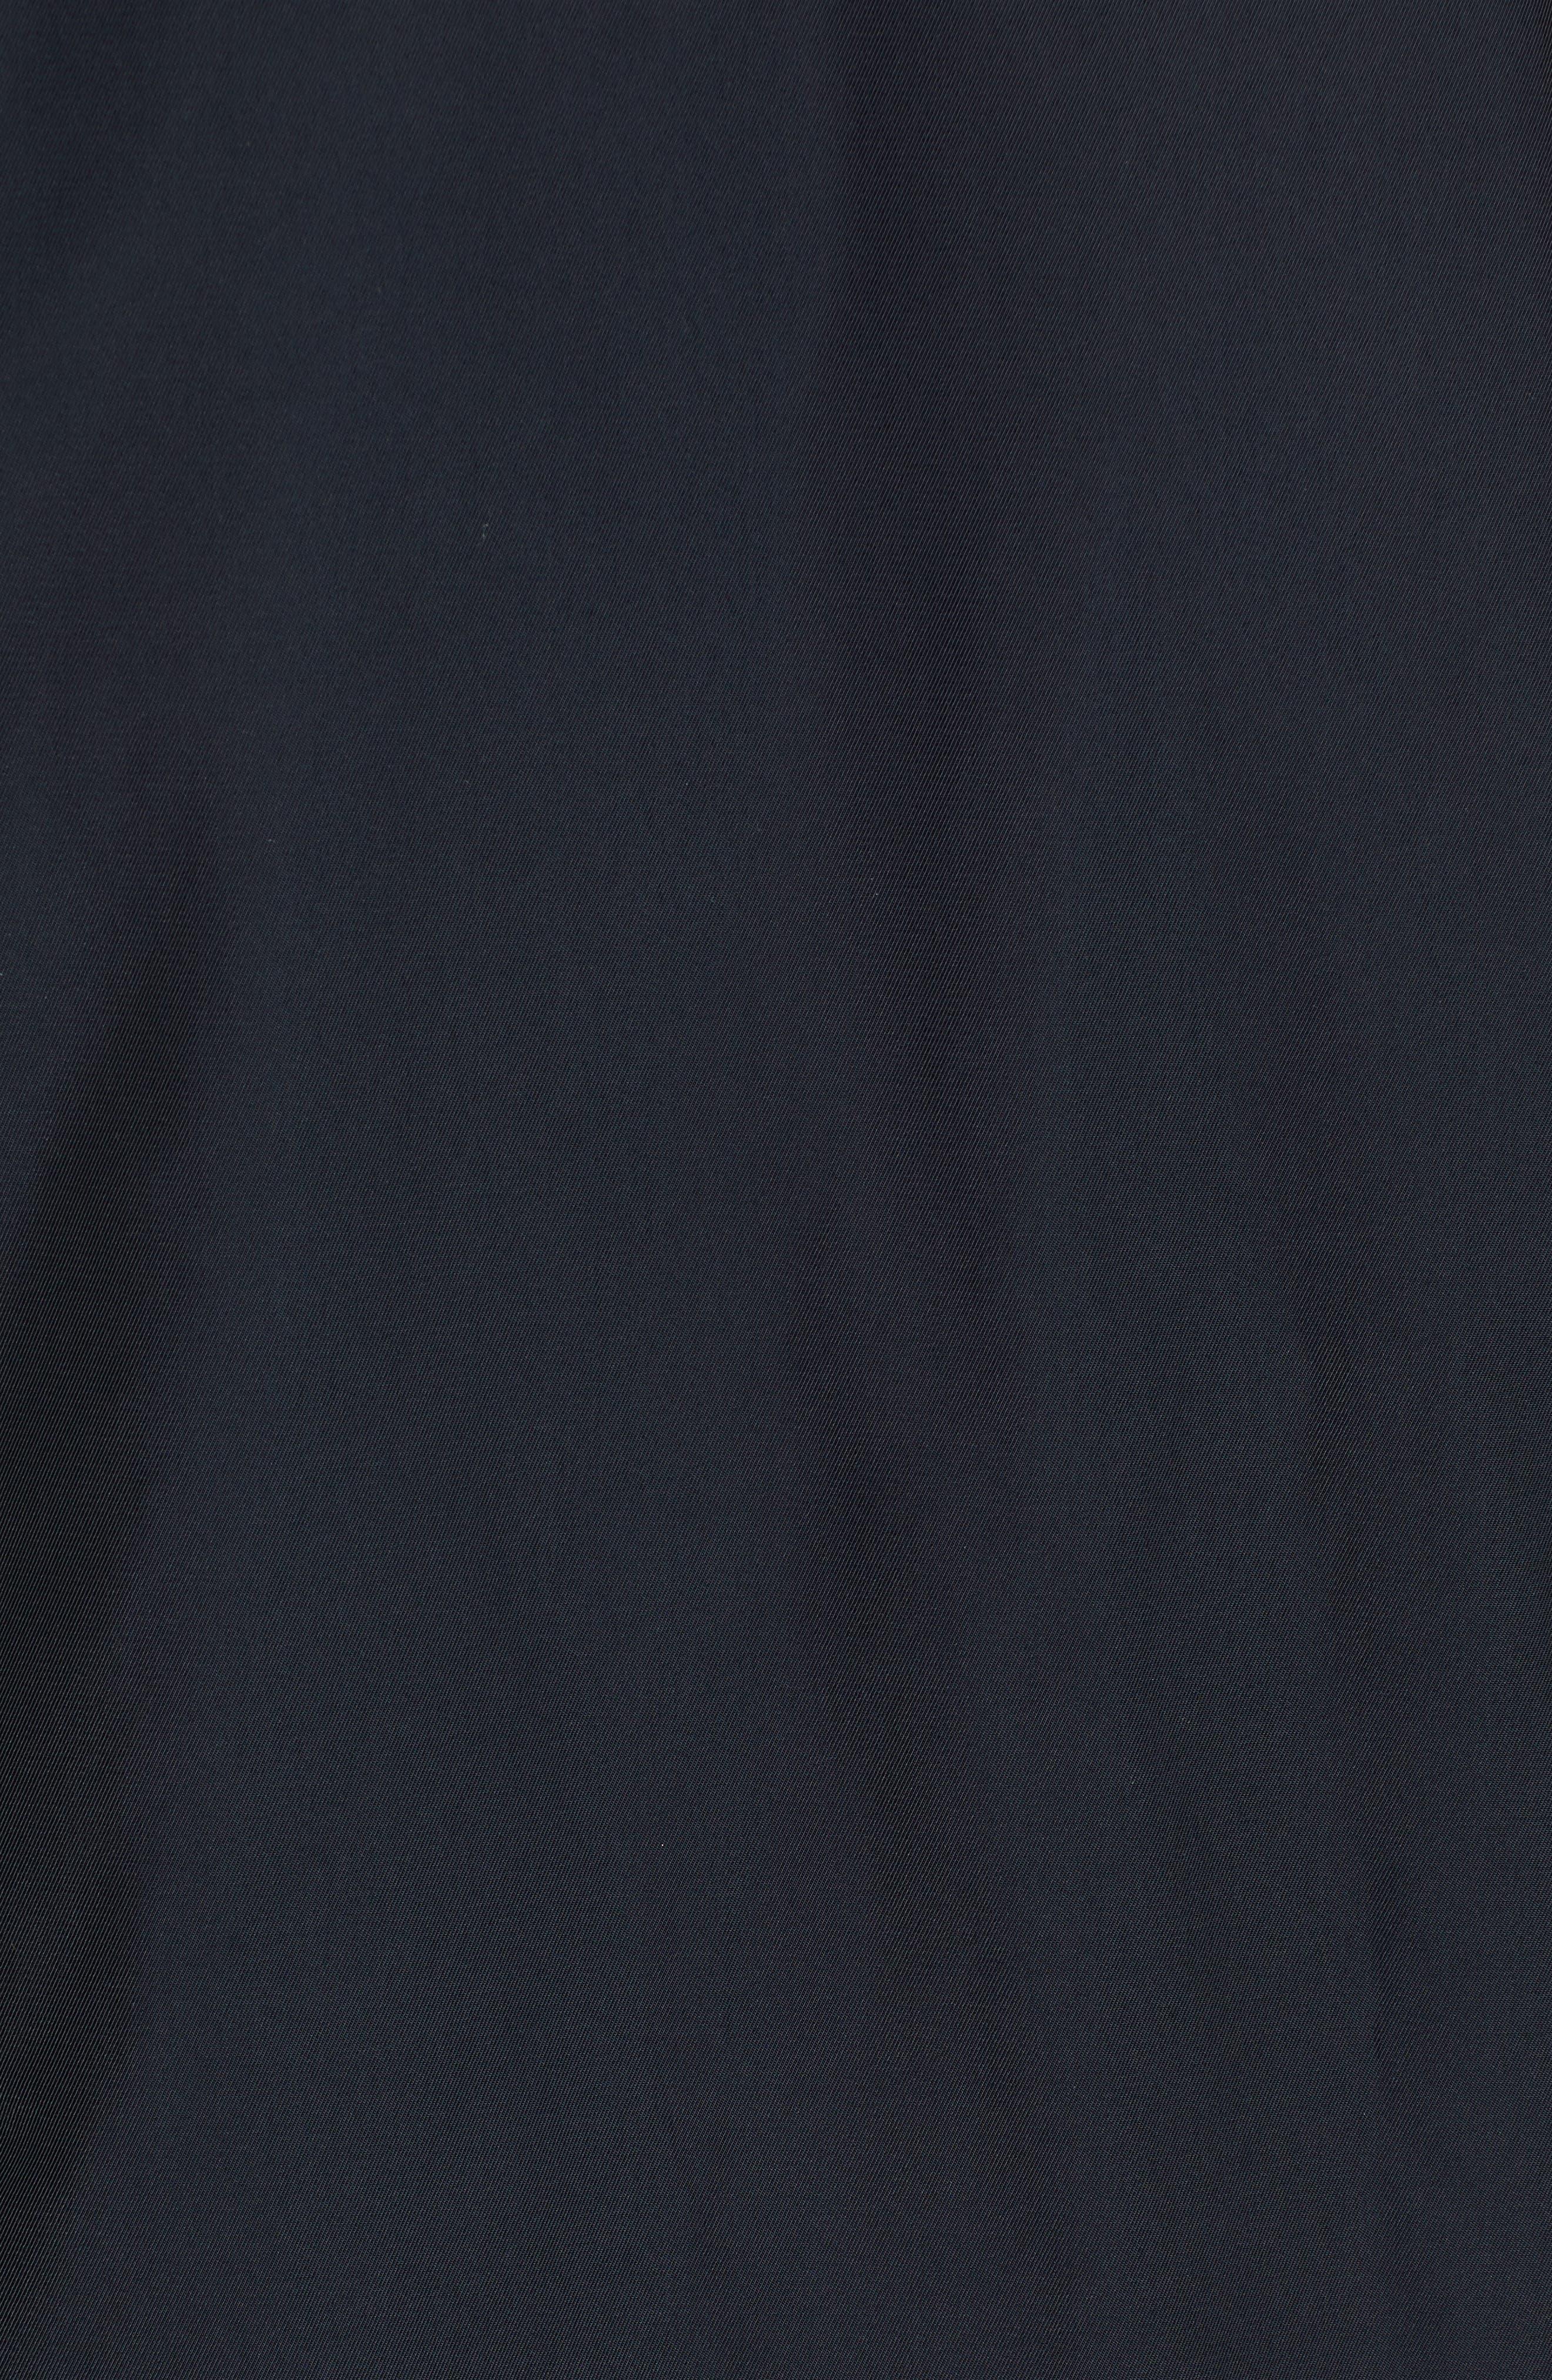 VANS,                             Thanks Coach Reversible Jacket,                             Alternate thumbnail 8, color,                             250